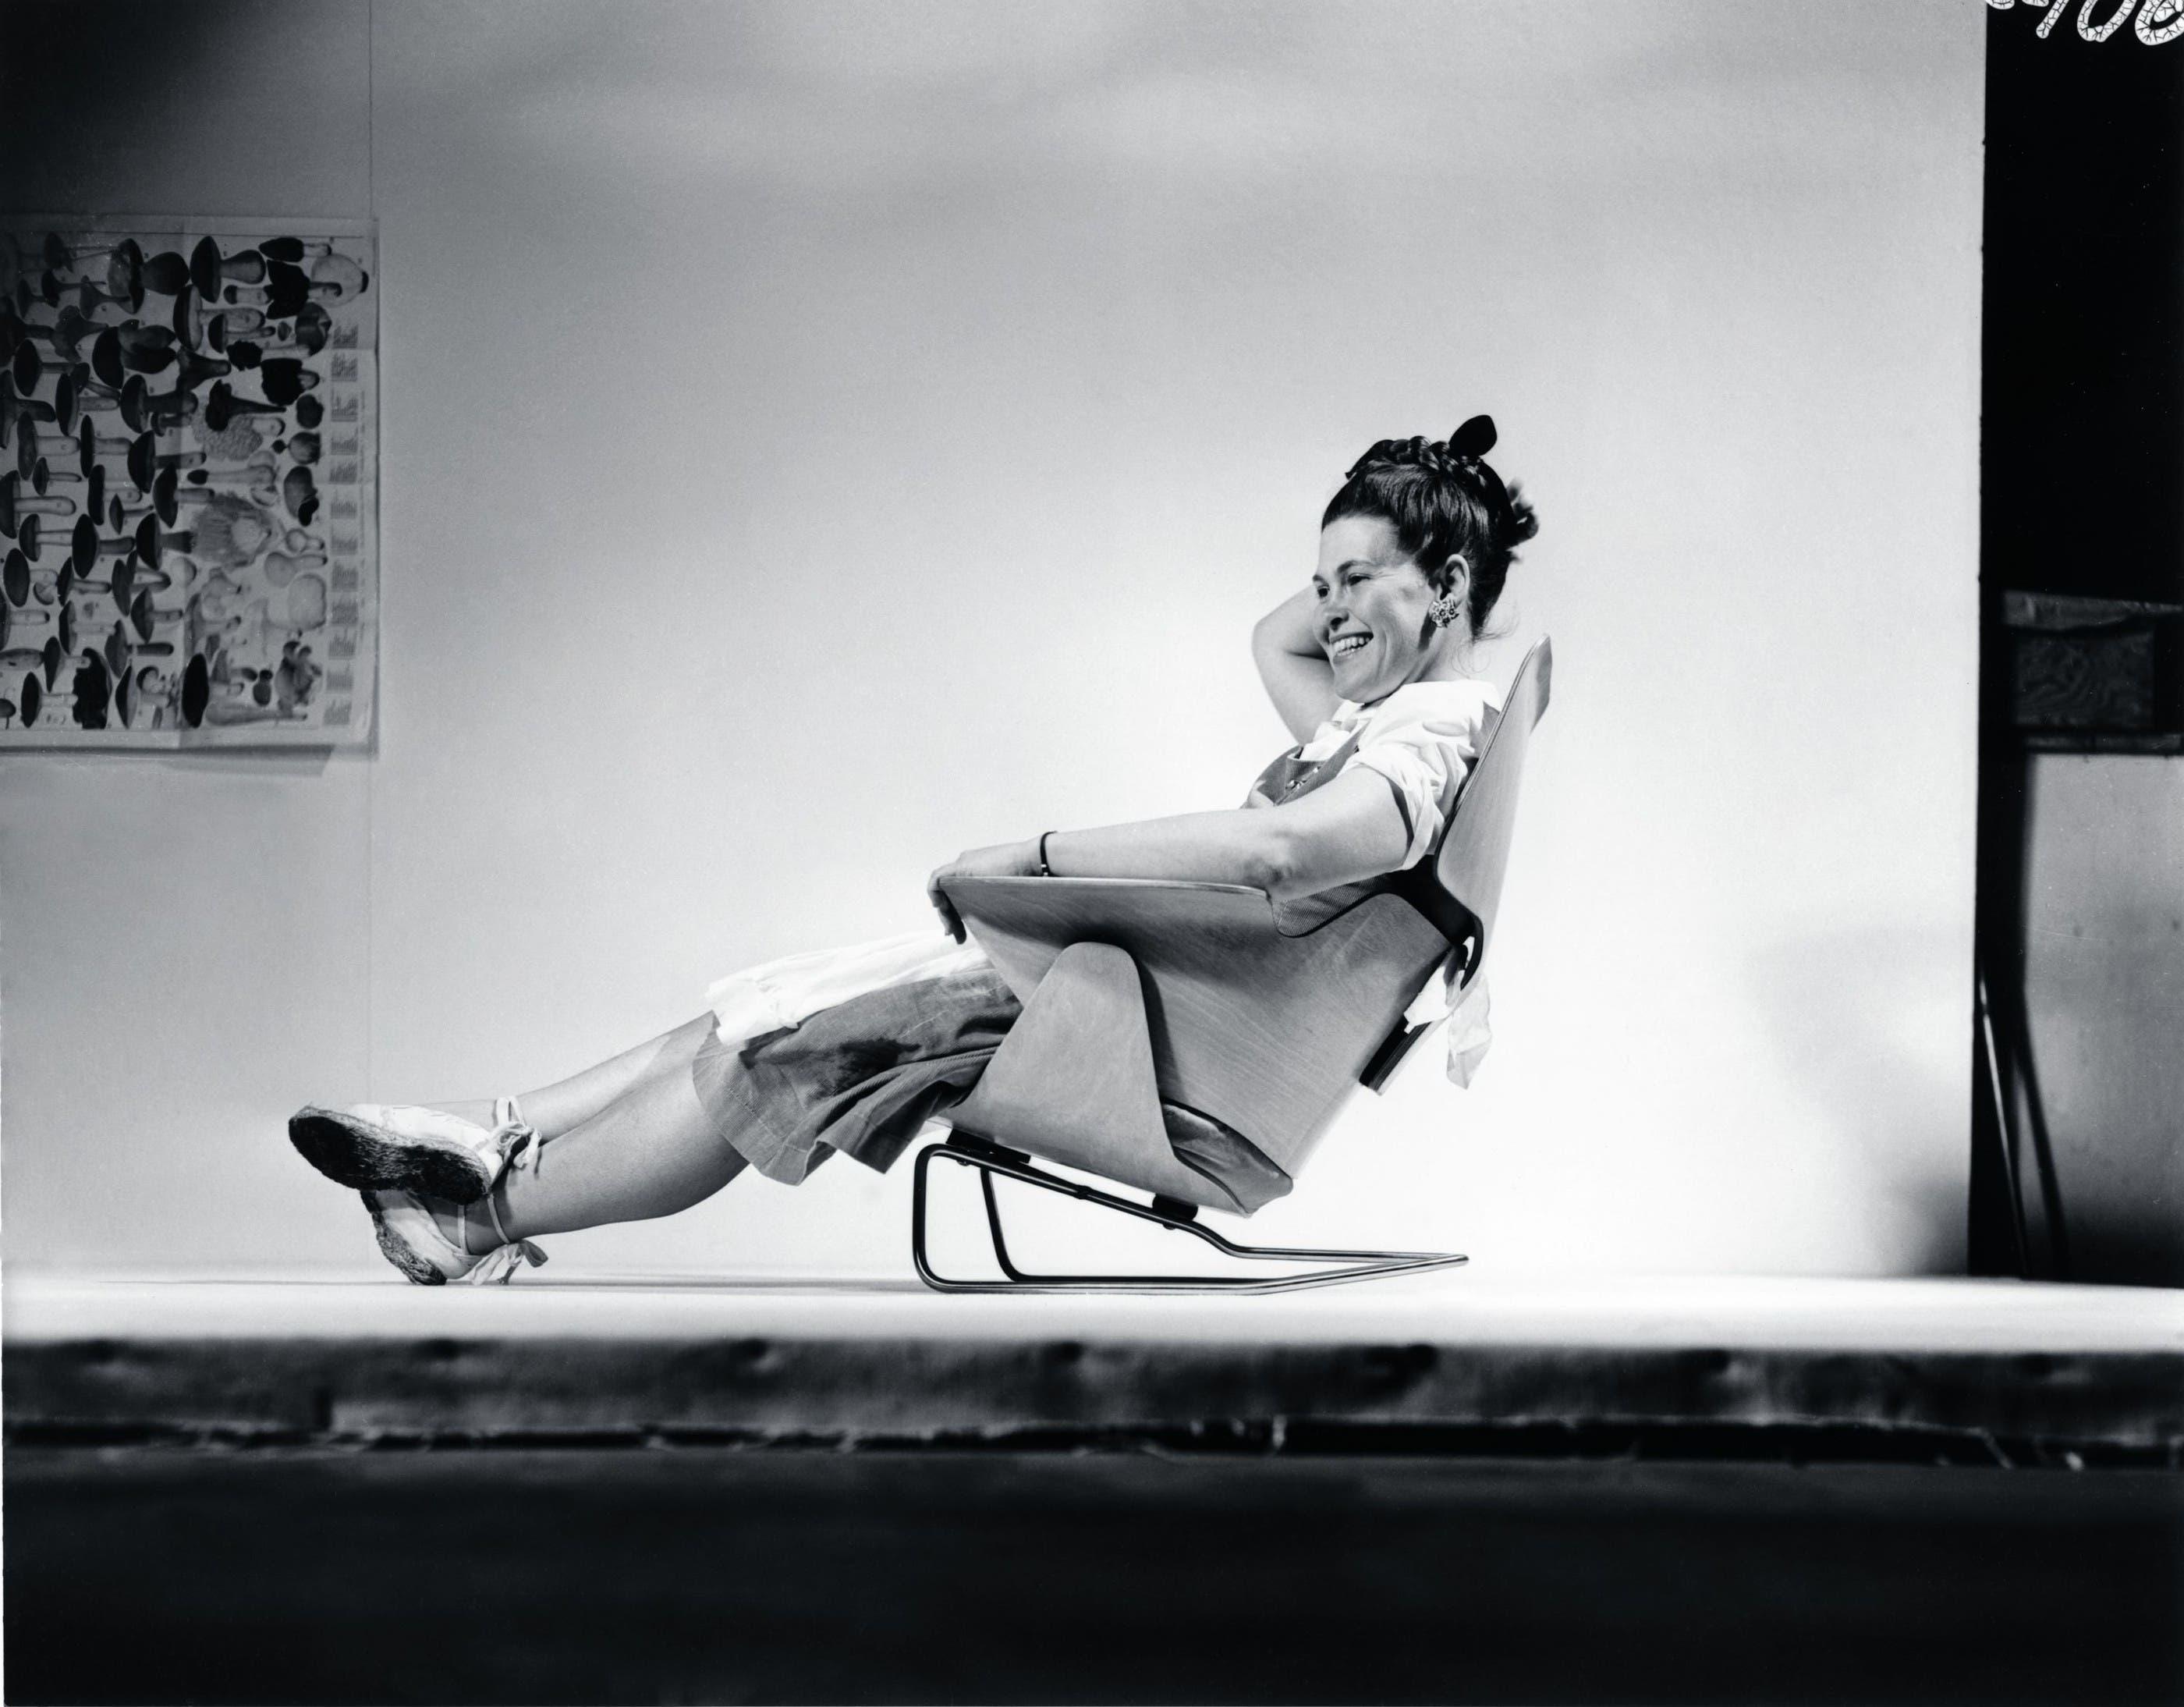 Stühle der Design-Pionierin Ray Eames.